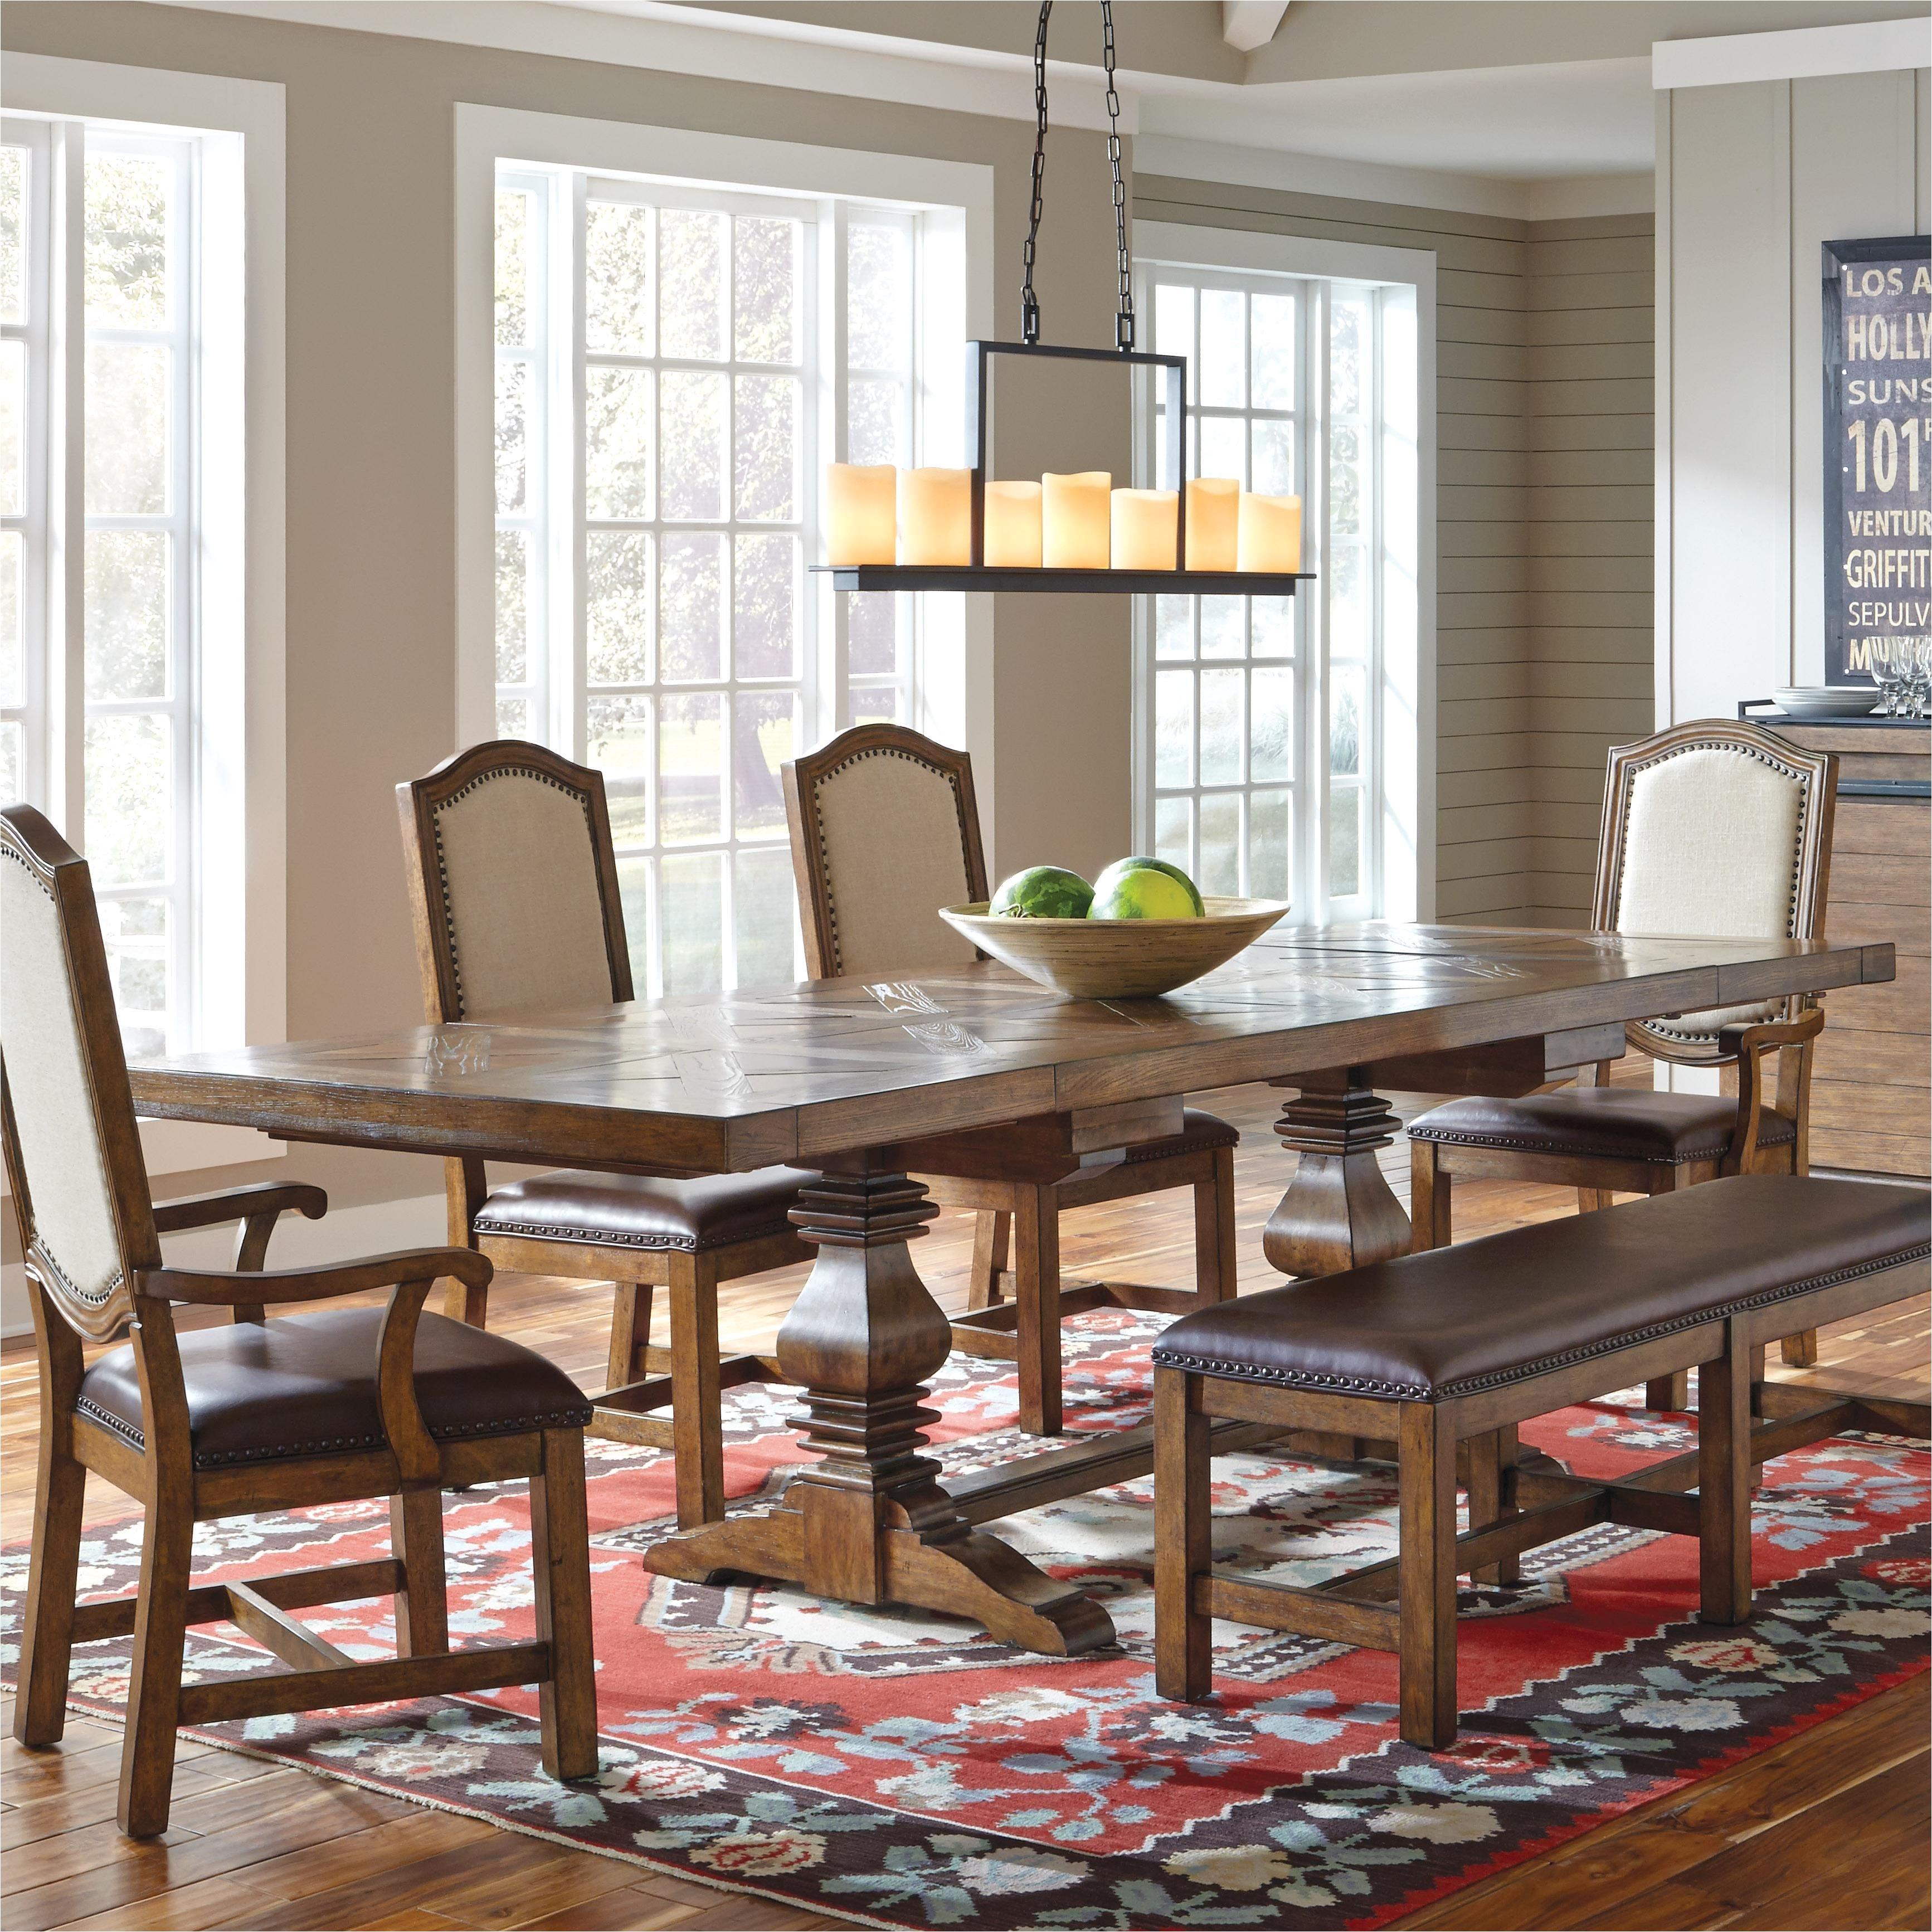 Elegant Design Chairs for Living Room